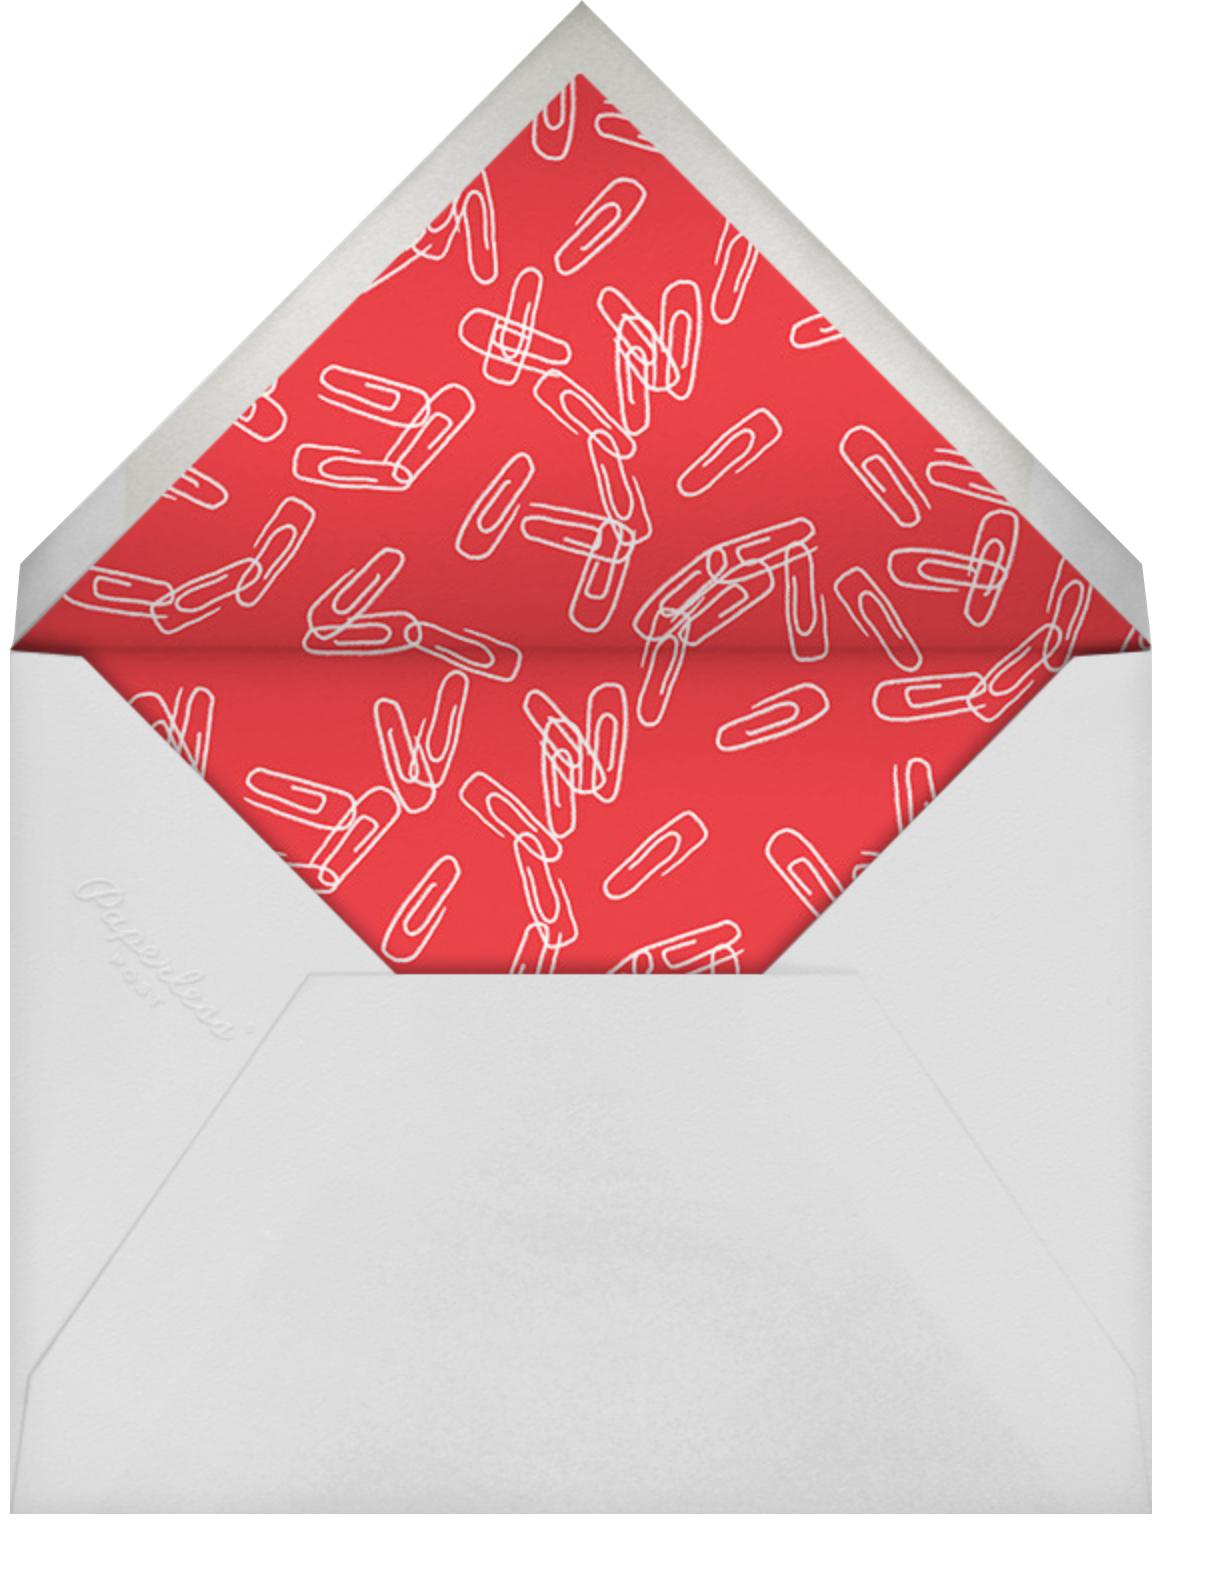 From Desk 'Til Dawn - Paperless Post - Corporate invitations - envelope back